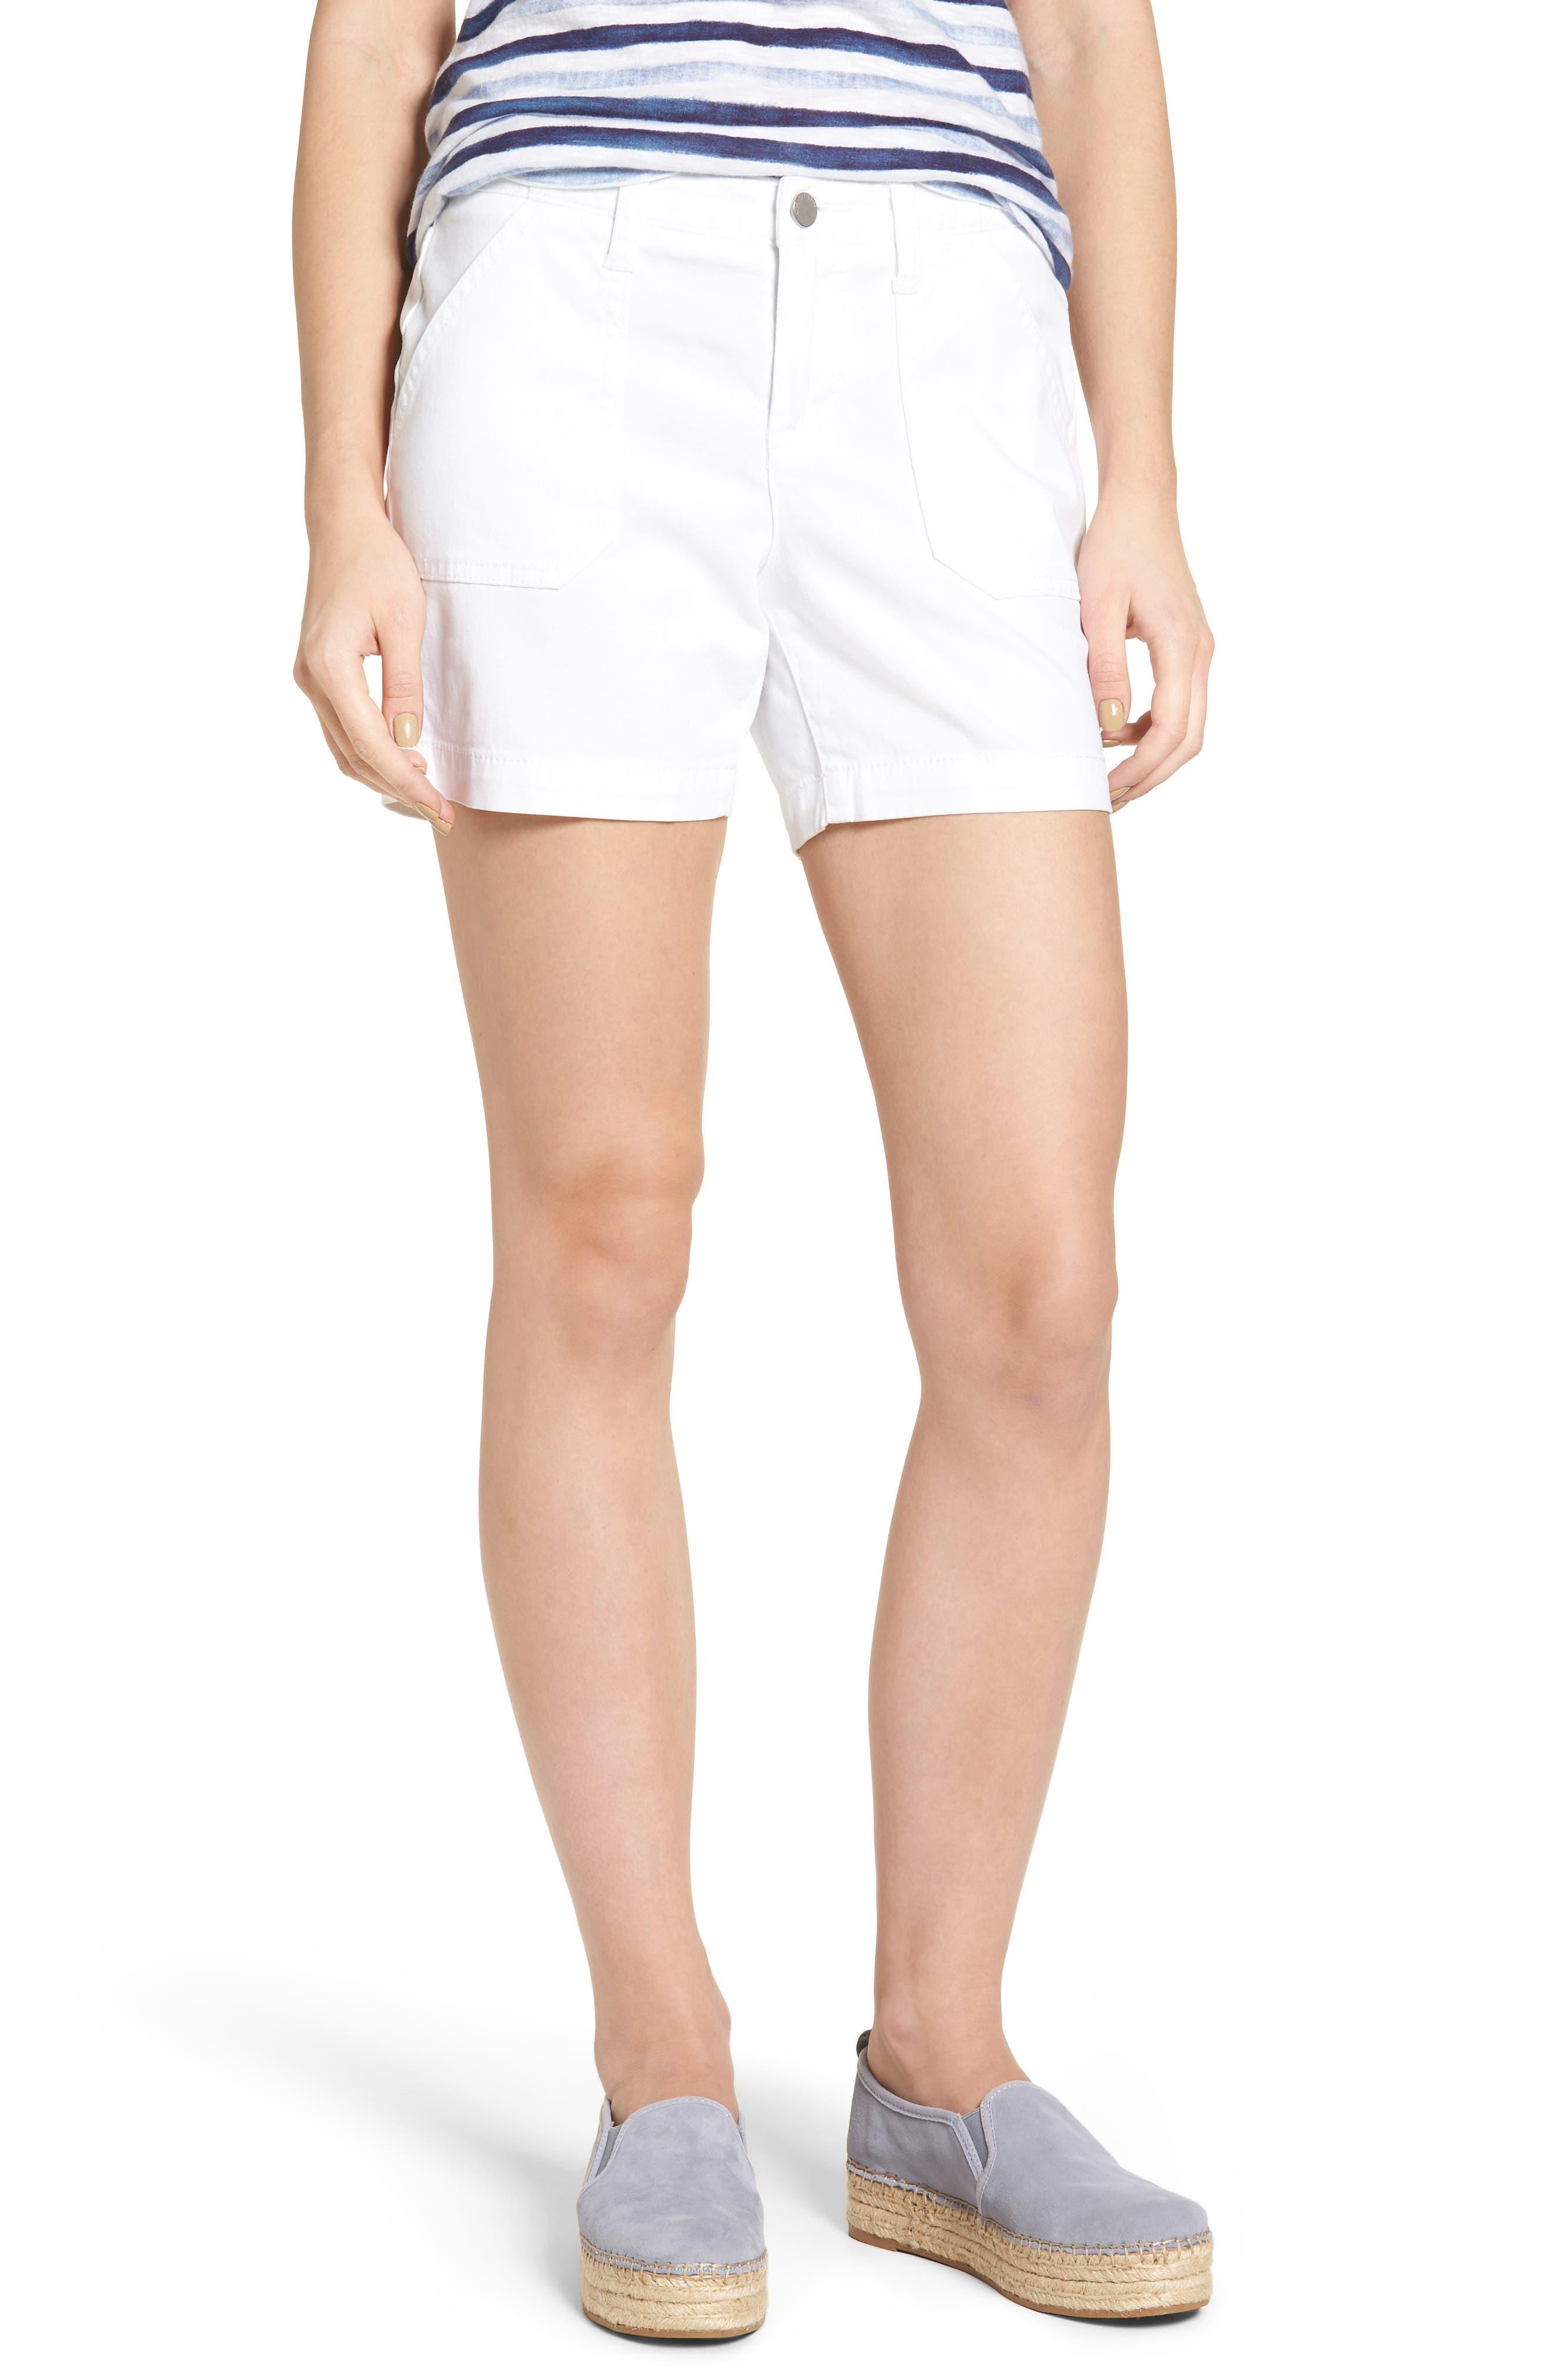 Petite Women's Caslon Utility Shorts